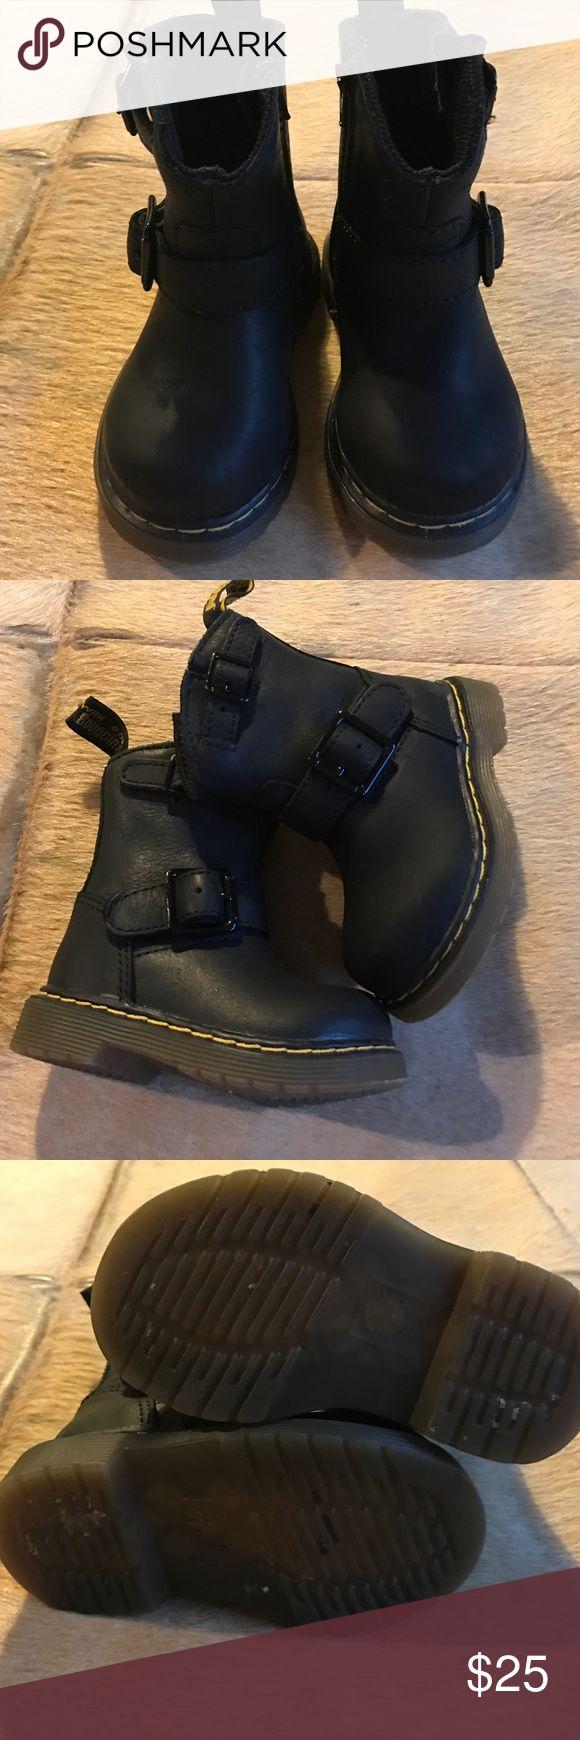 Dr Martens boots black Dr Martens black boots is great condition, inside zipper entry. No pp, no trades dr marten Shoes Baby & Walker